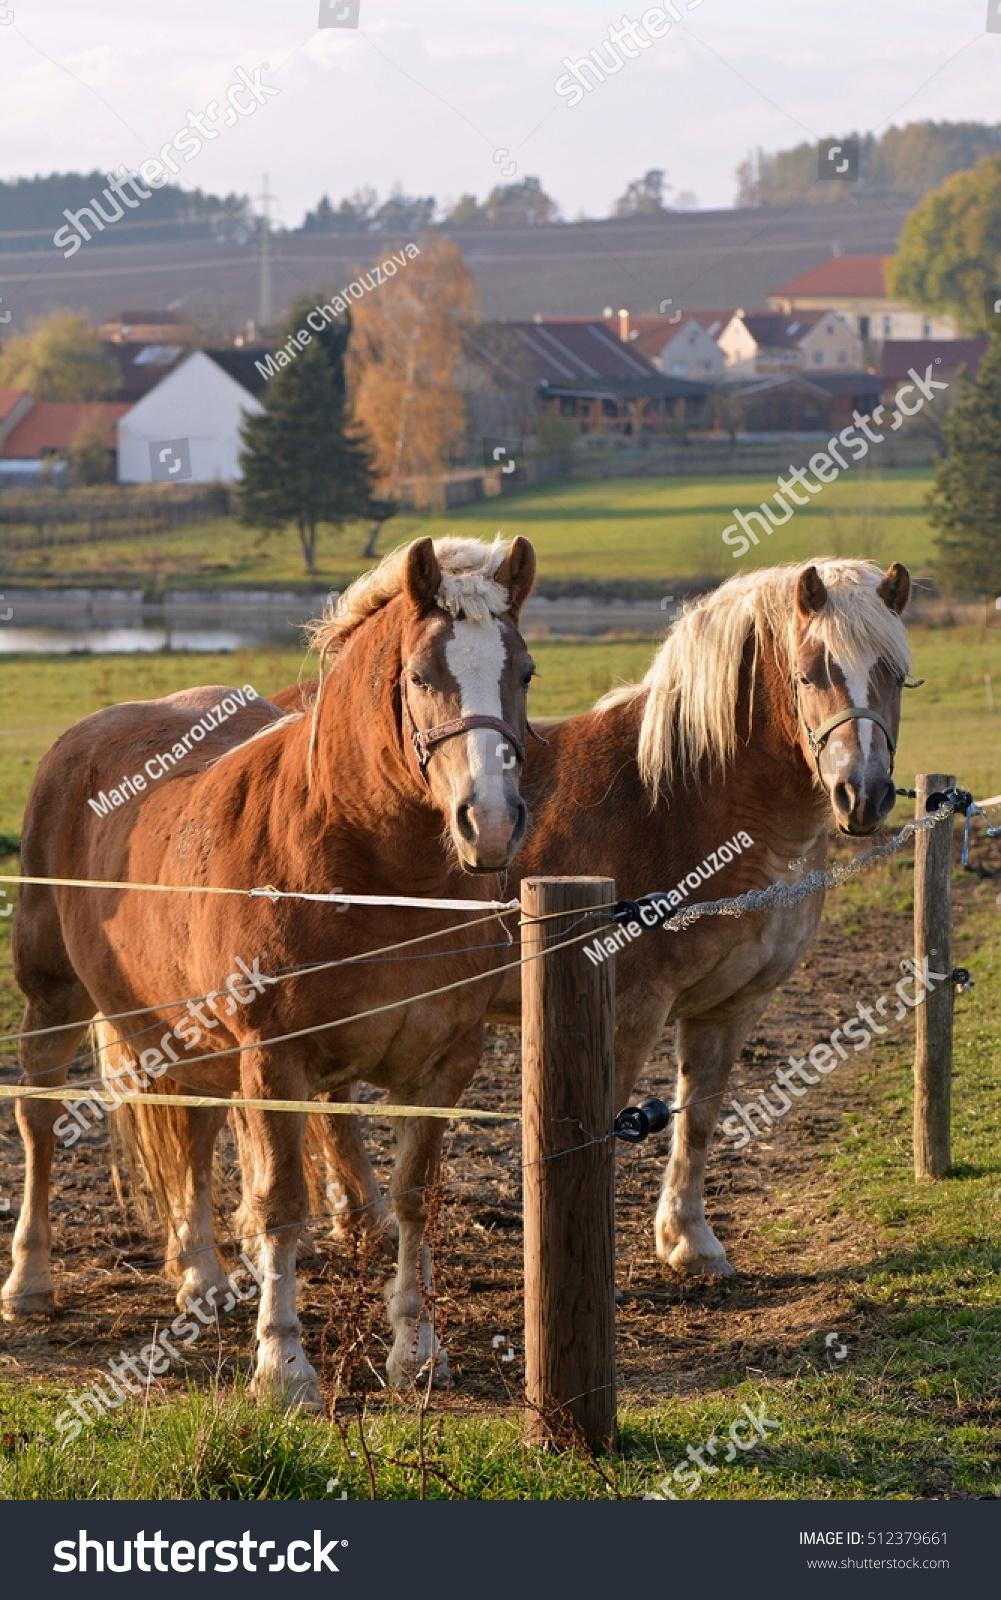 Horses On Pasture Stok Fotoğrafı 512379661